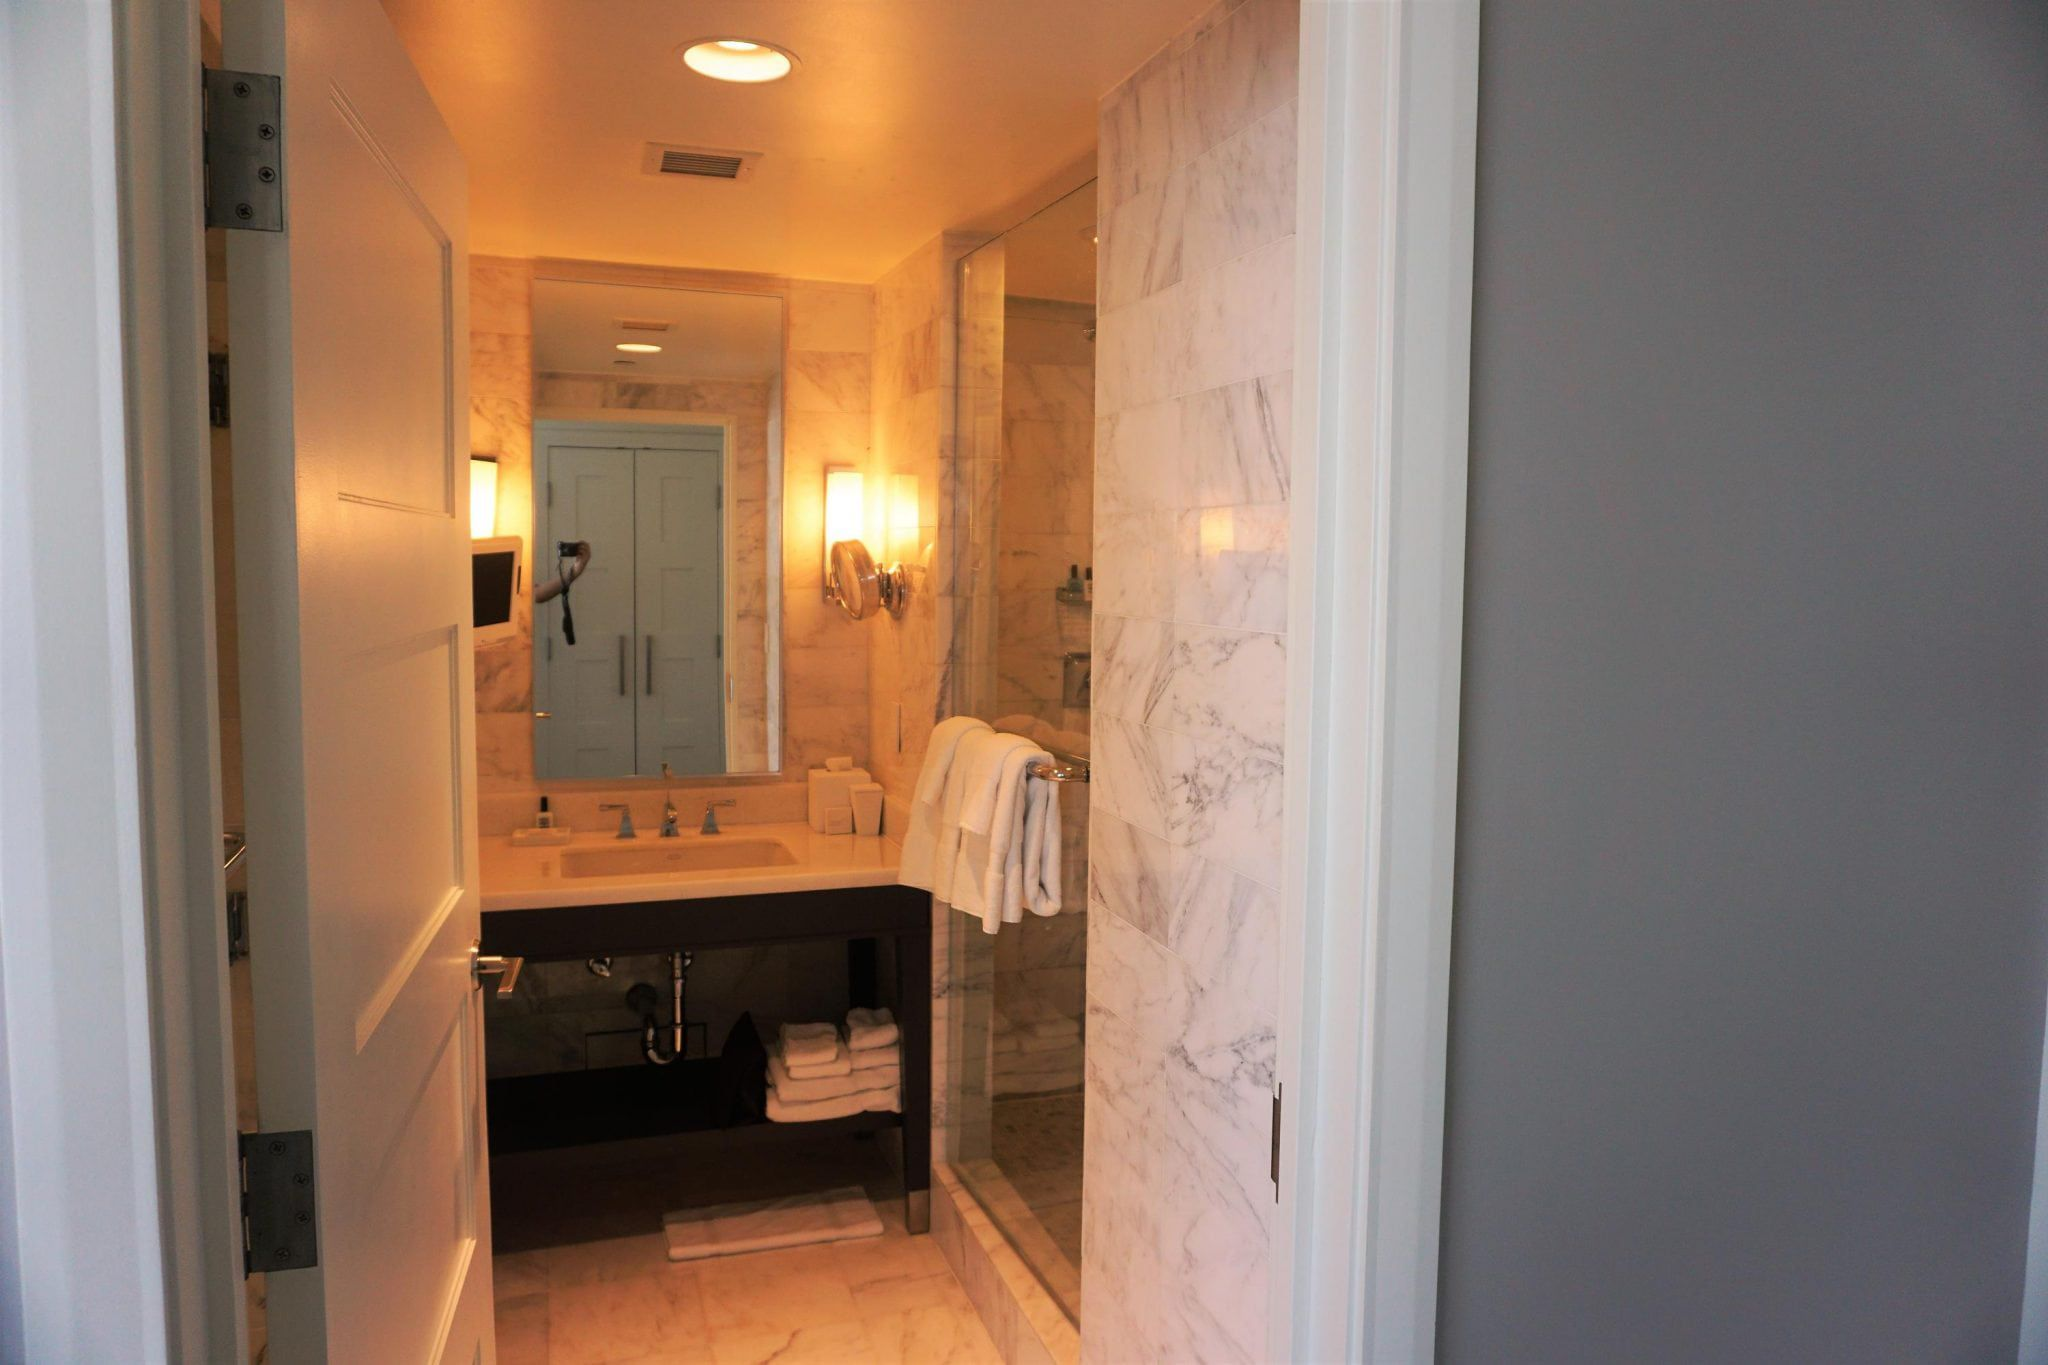 Bathmroom at Fontainebleau